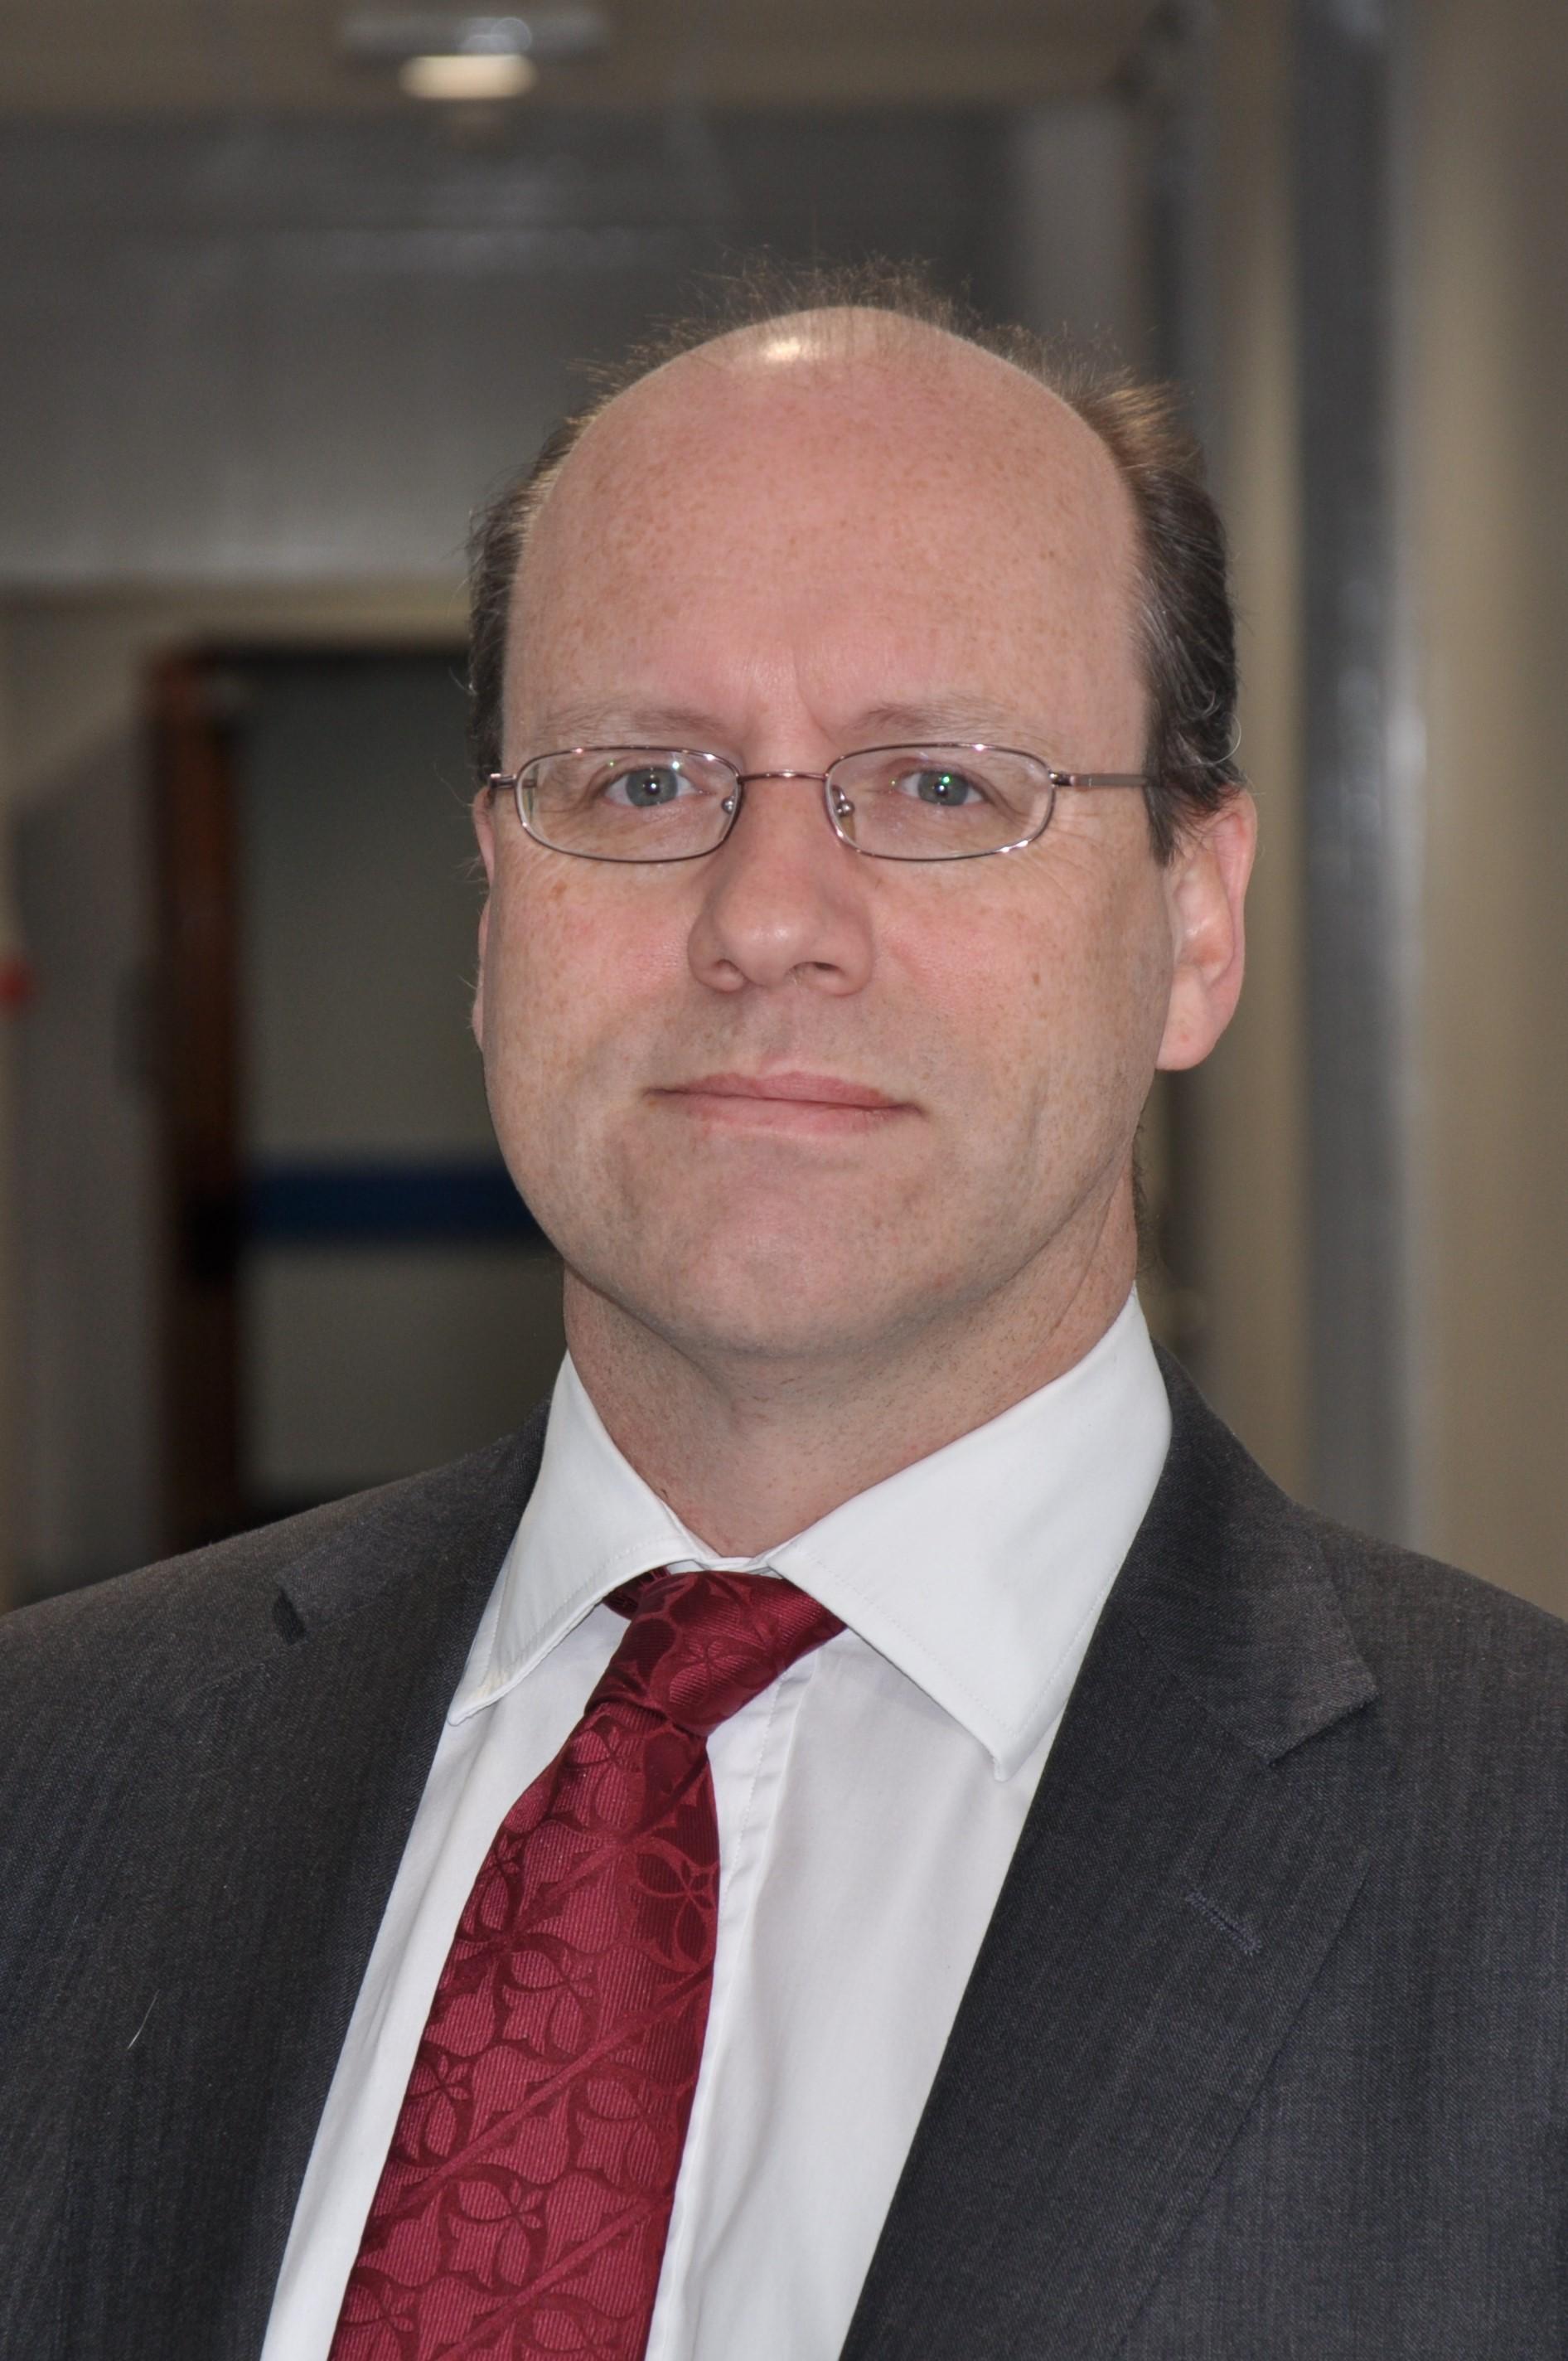 Felix Ritchie